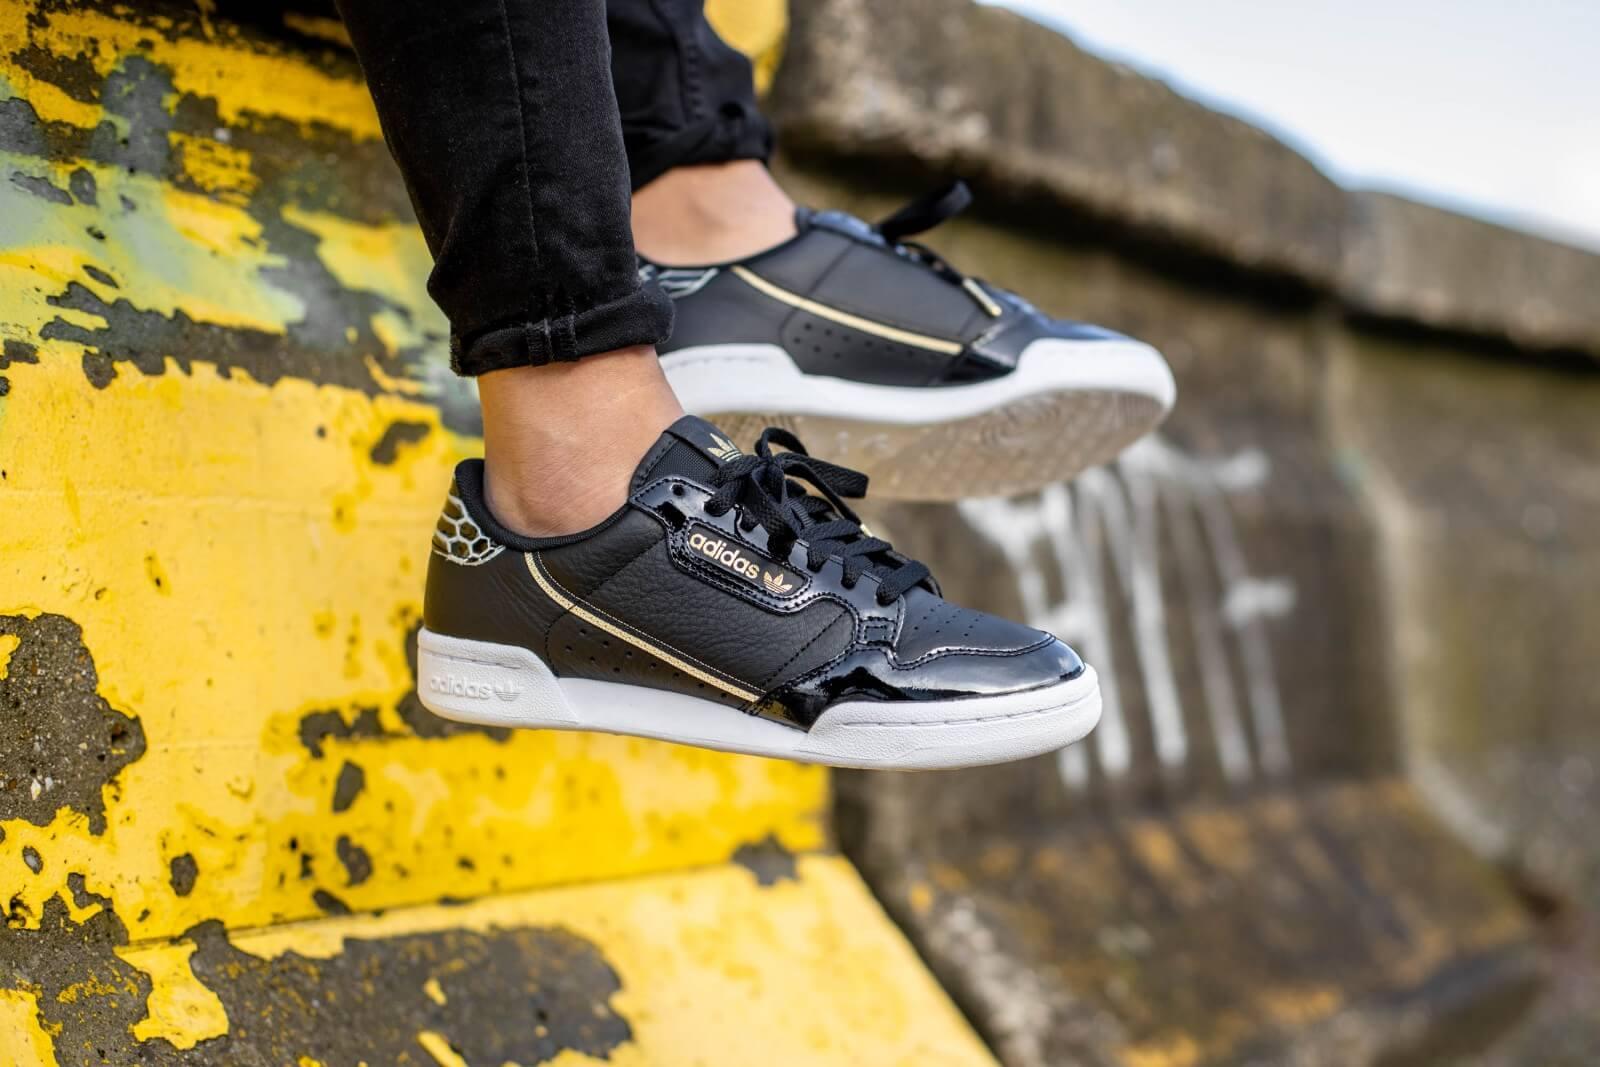 Adidas Women's Continental 80 Core Black/Footwear White